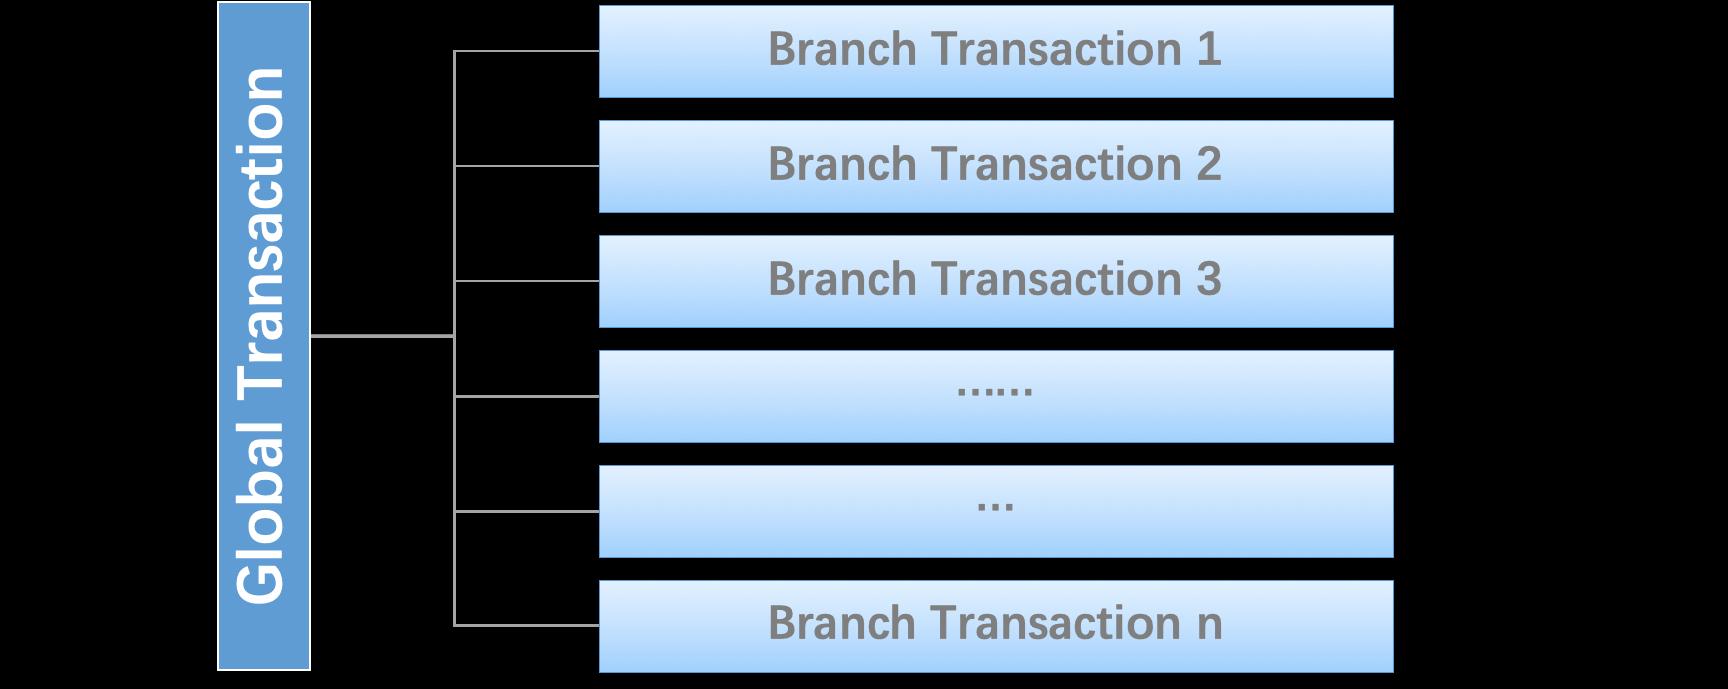 Global & Branch